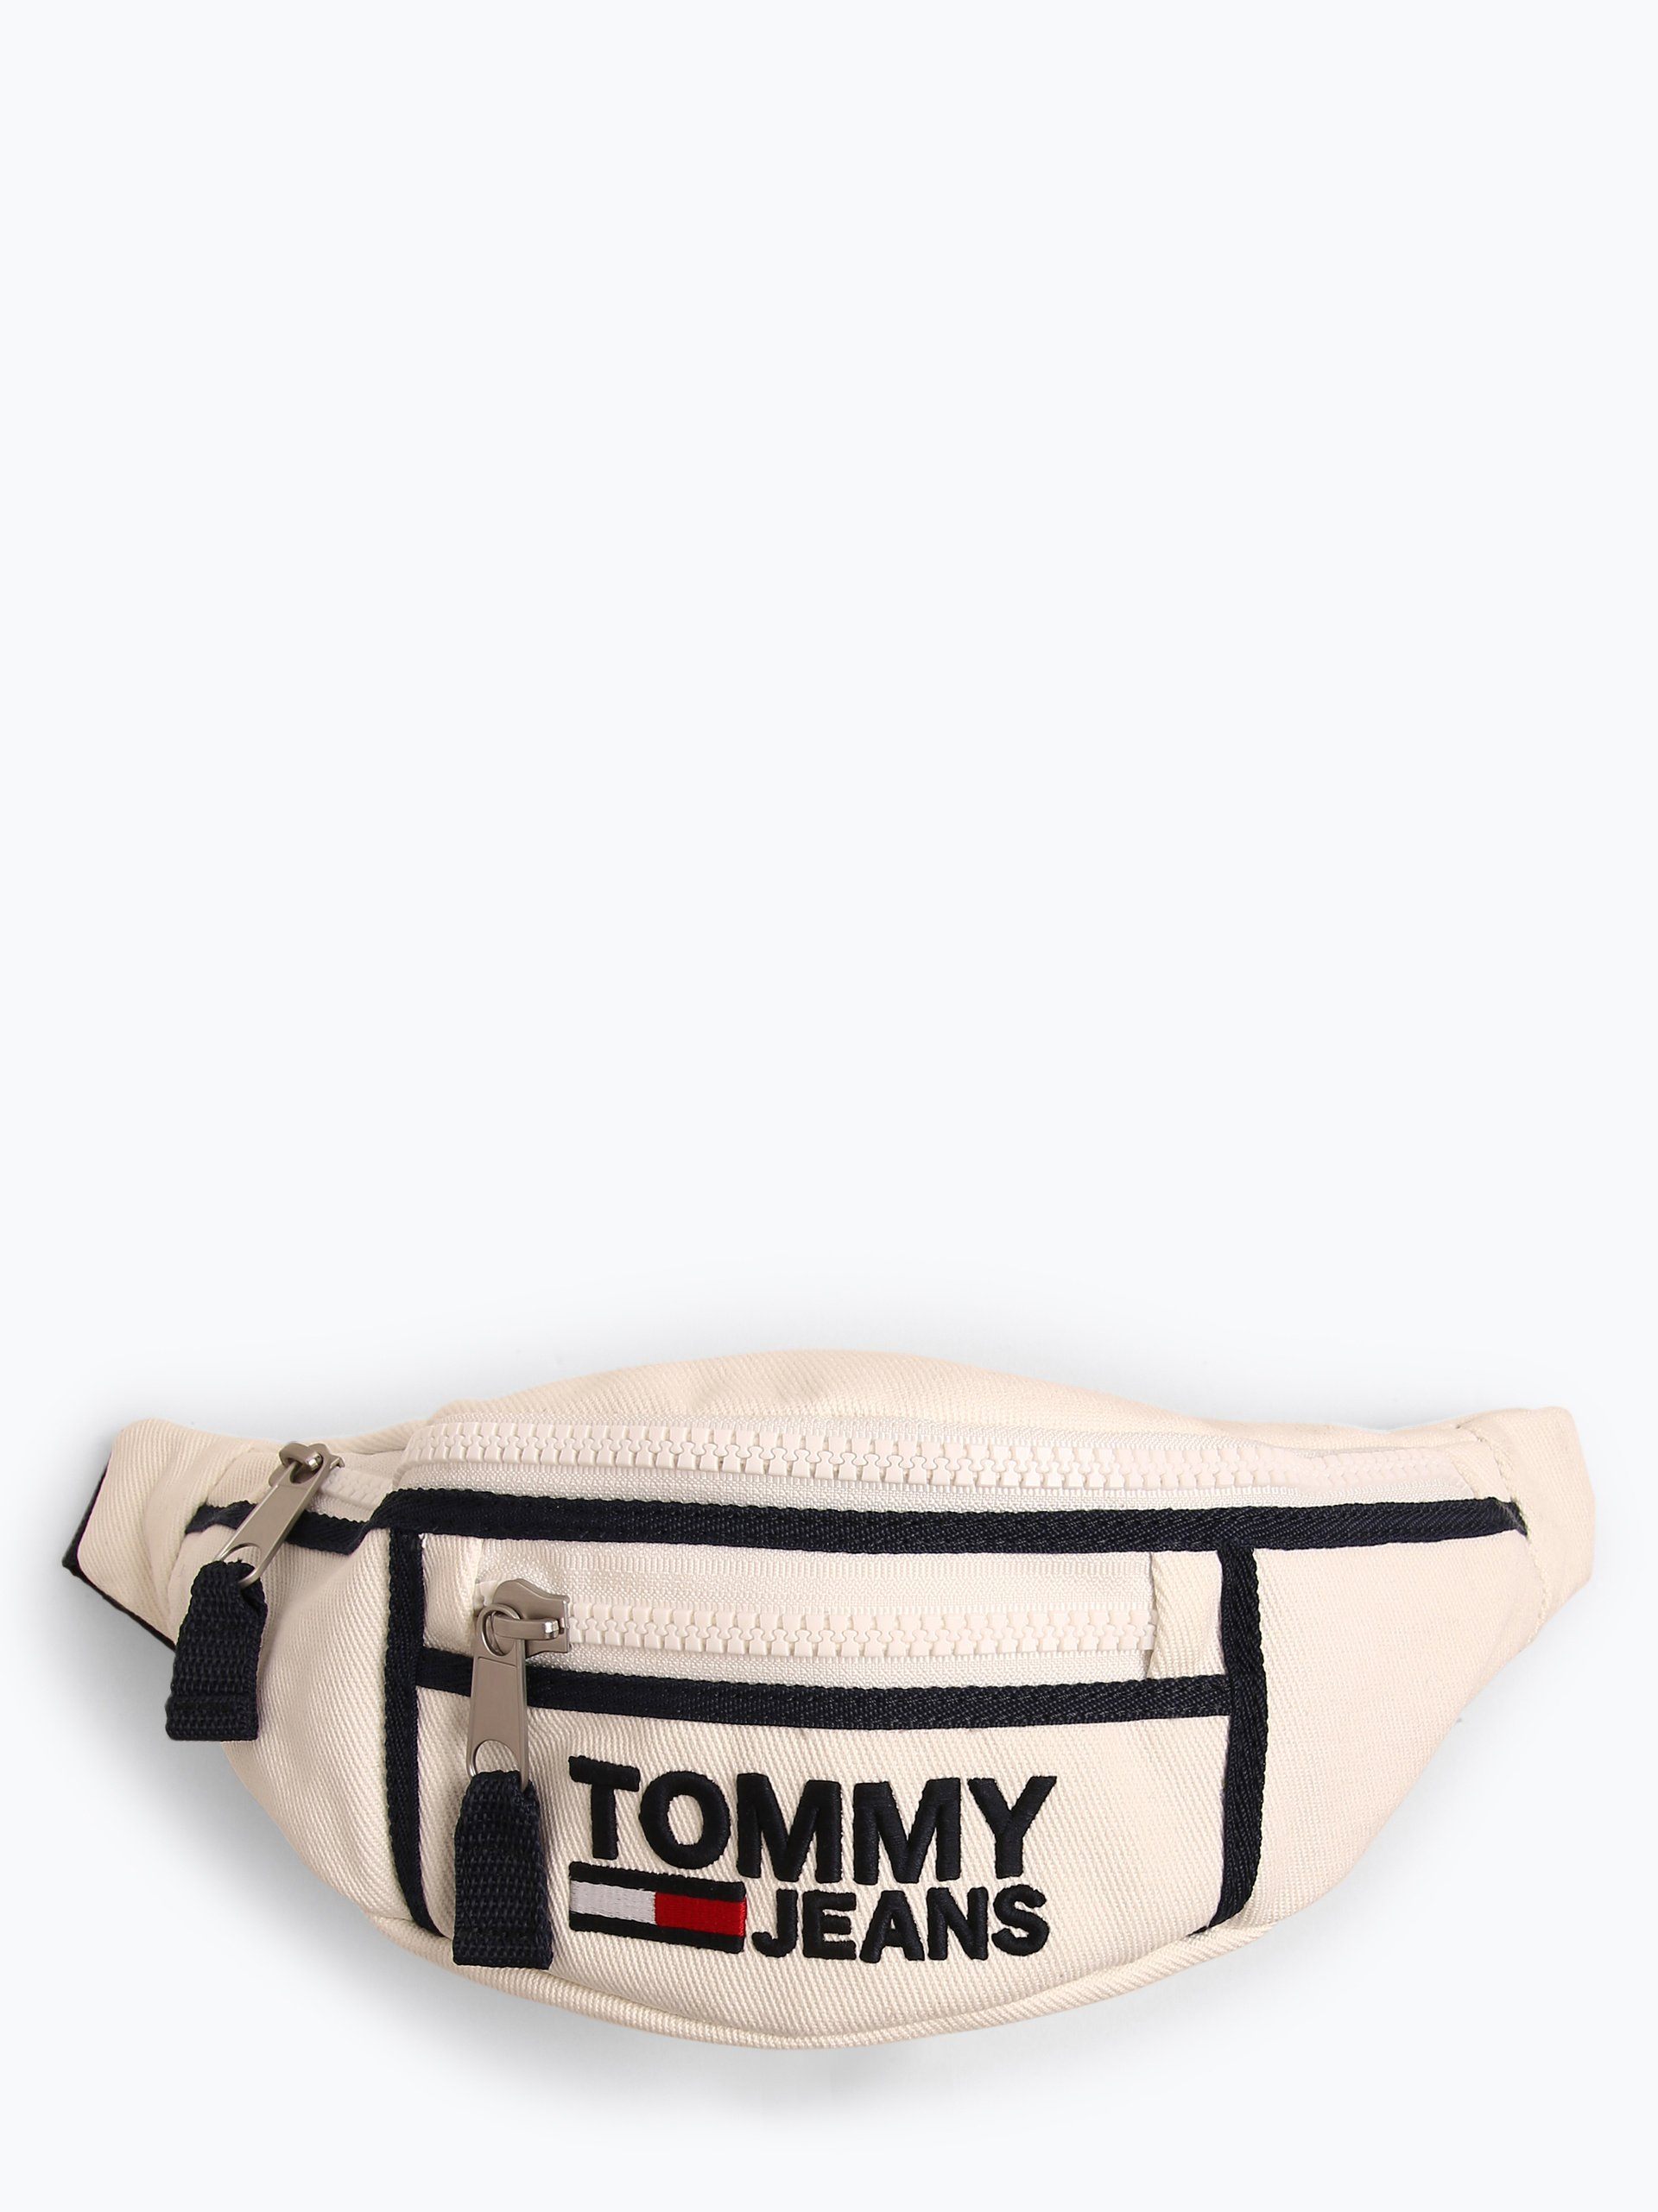 Tommy Jeans Gürteltasche